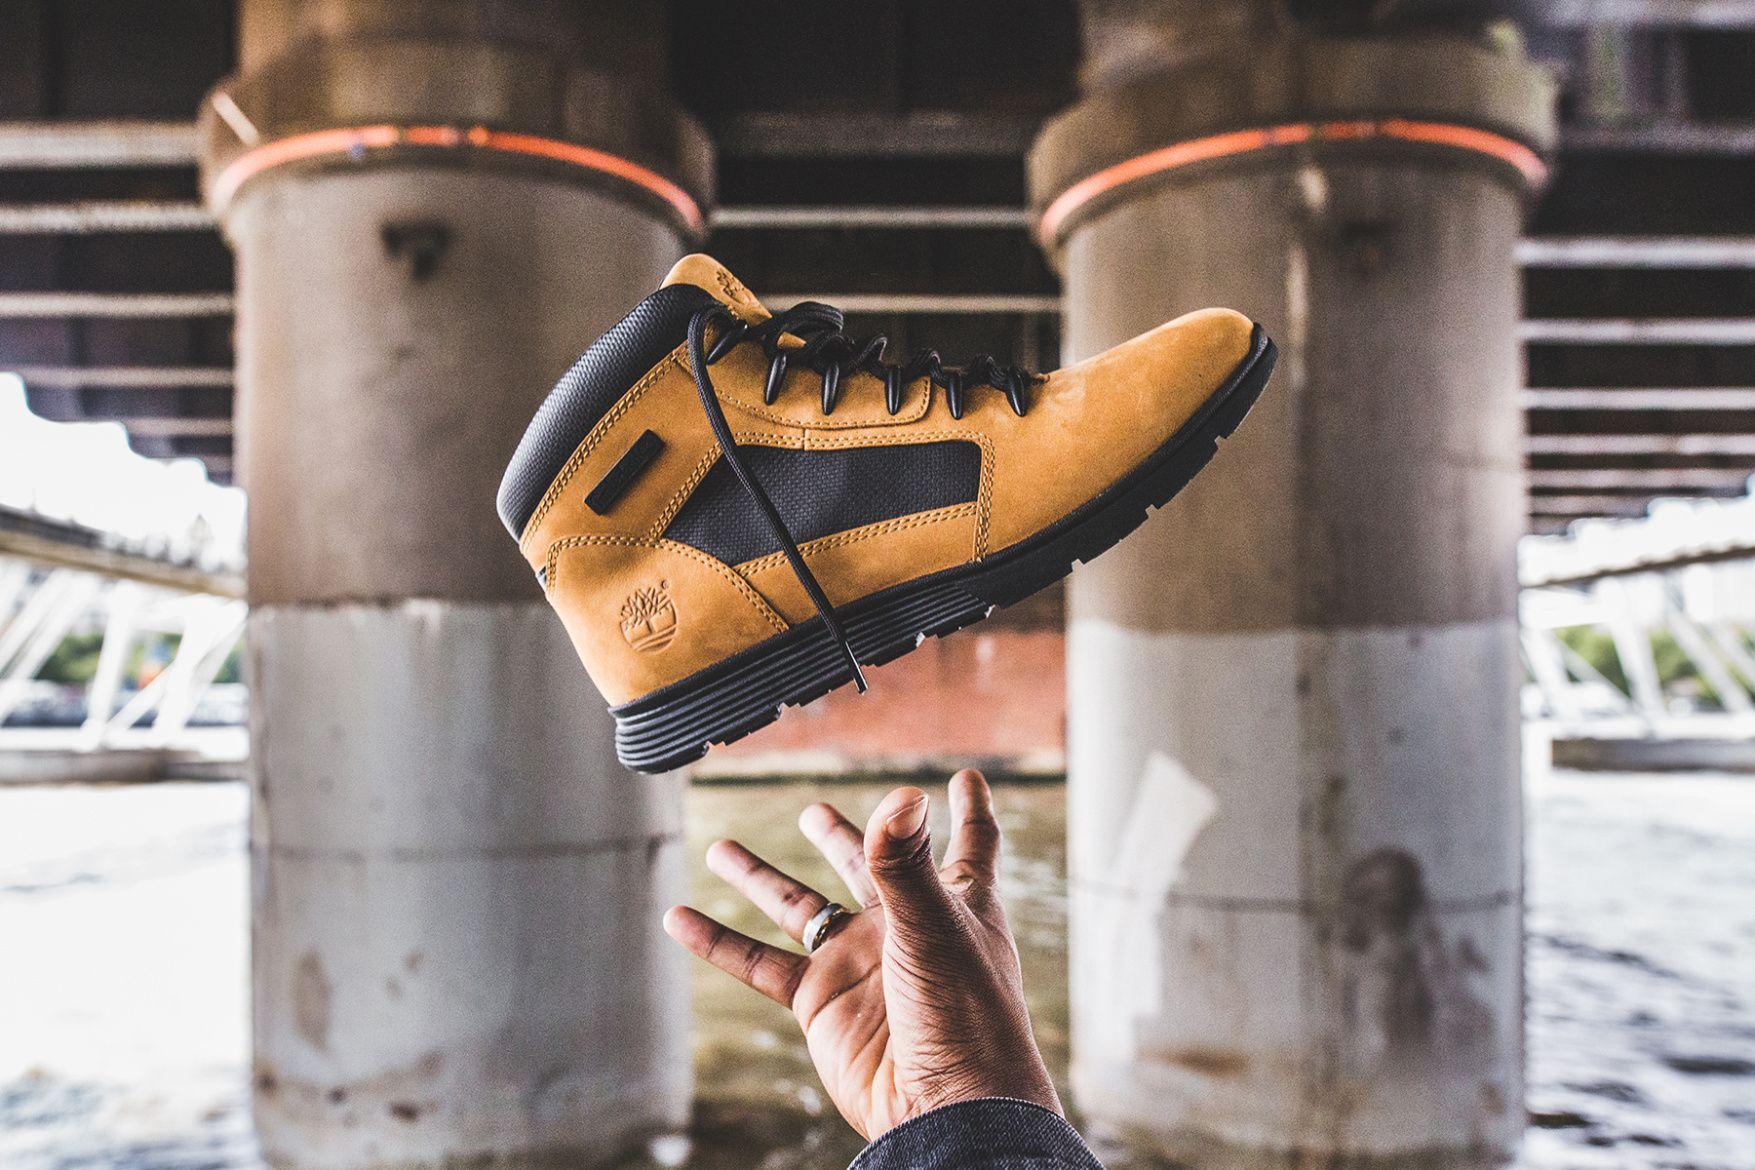 Timberland Boot-Sneaker Hybrid the Killington Hiker a44f63676c9f